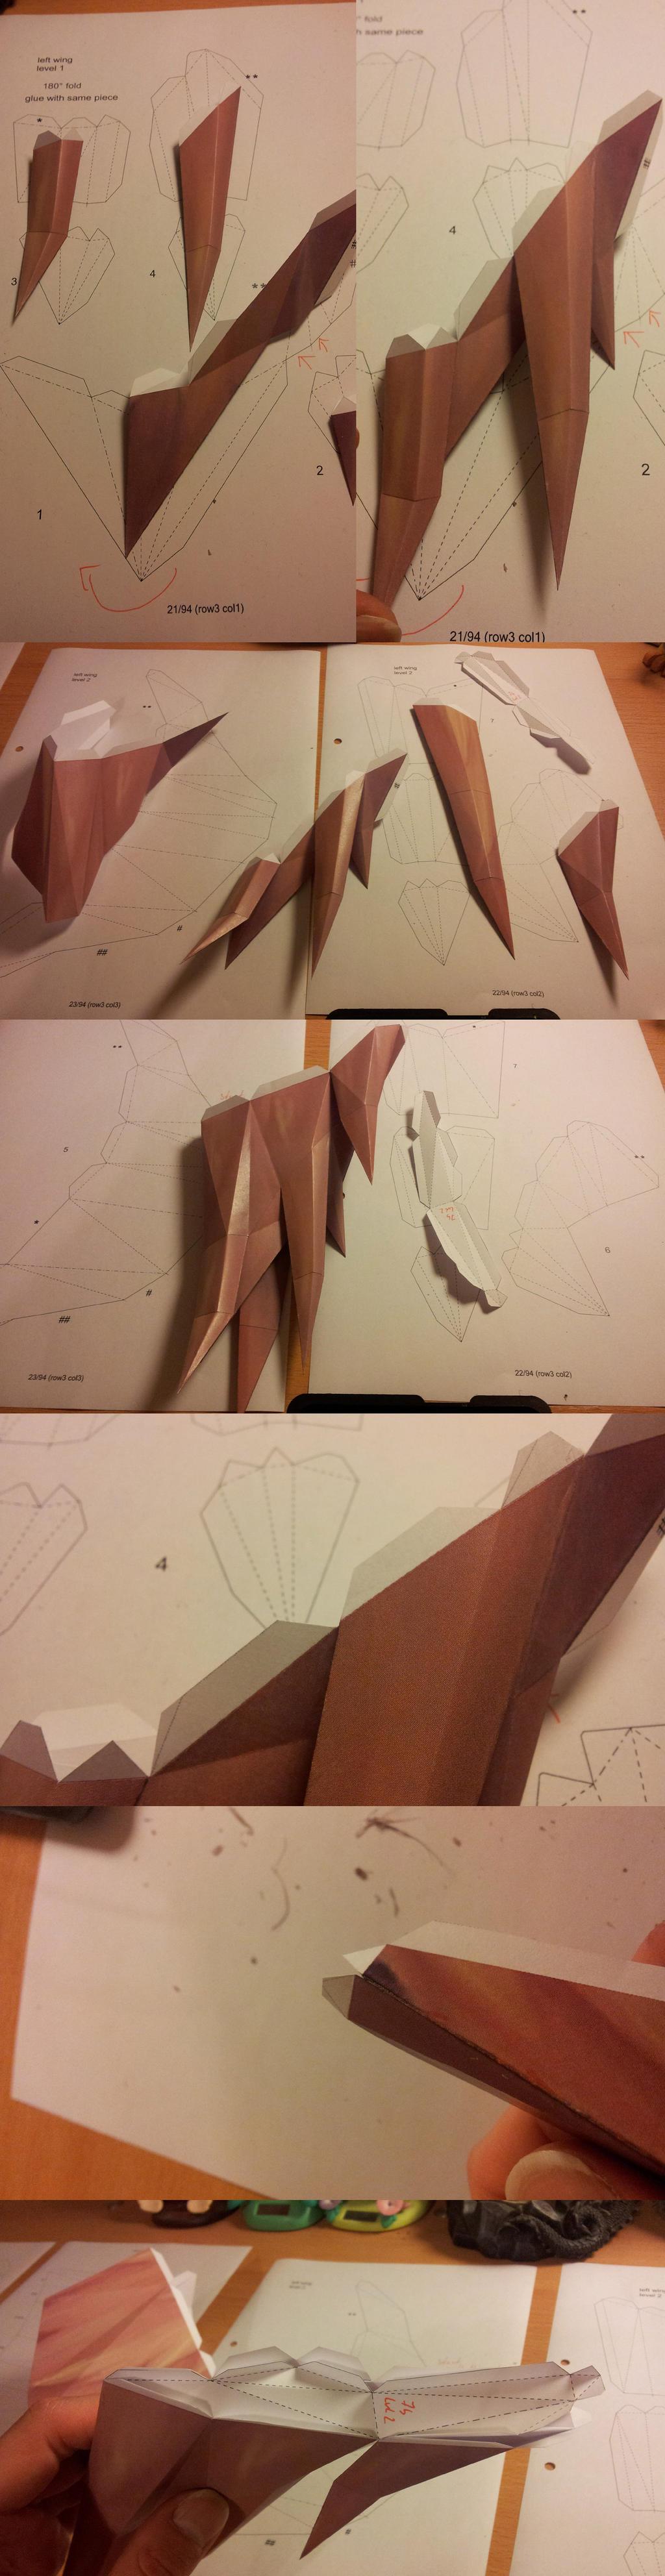 Avian Defender - wings part 1 of 3